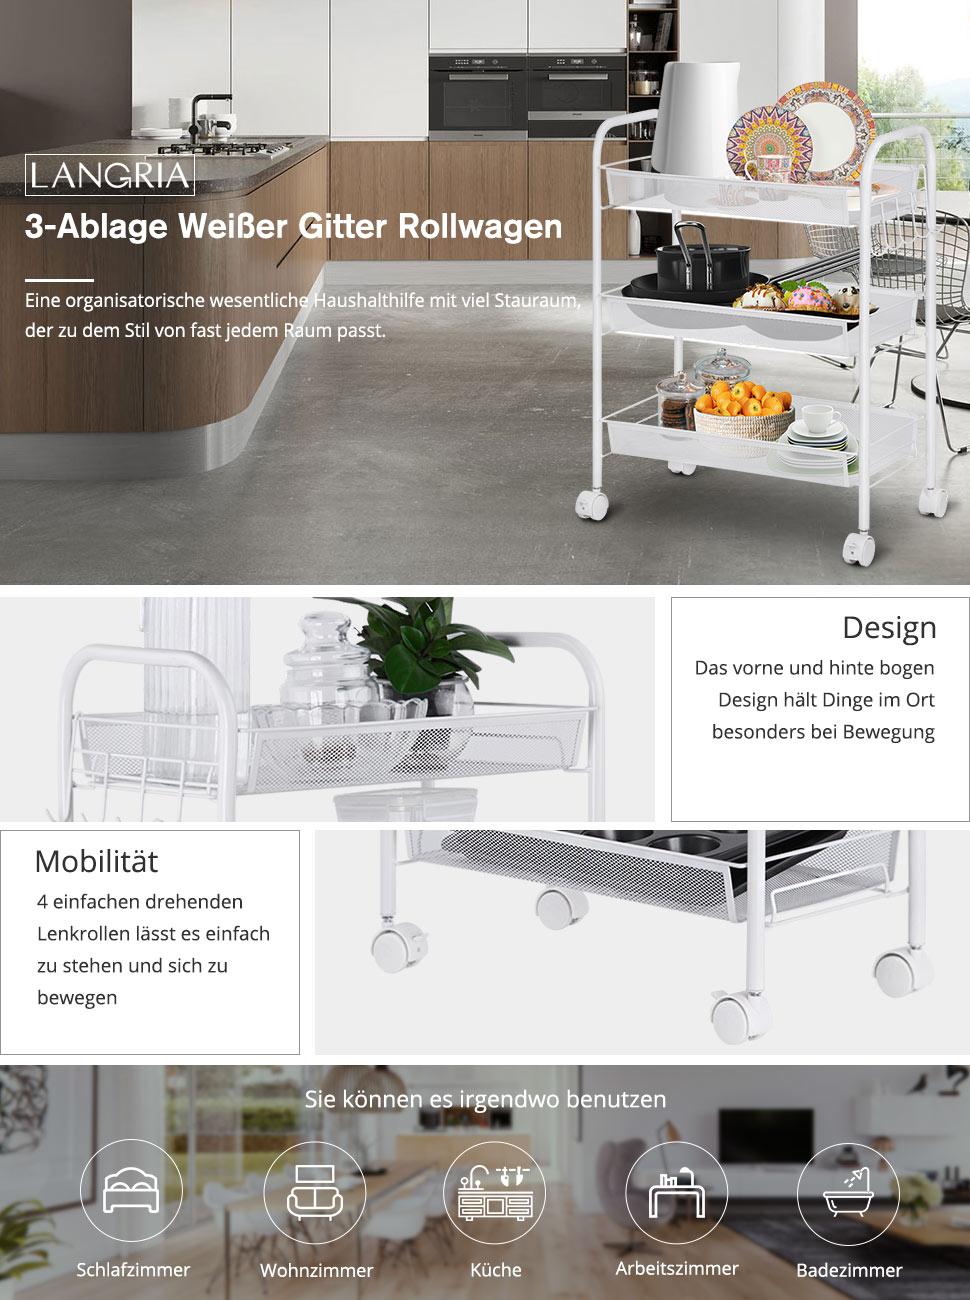 Berühmt Einfache Küche Design Software Fotos - Küchenschrank Ideen ...